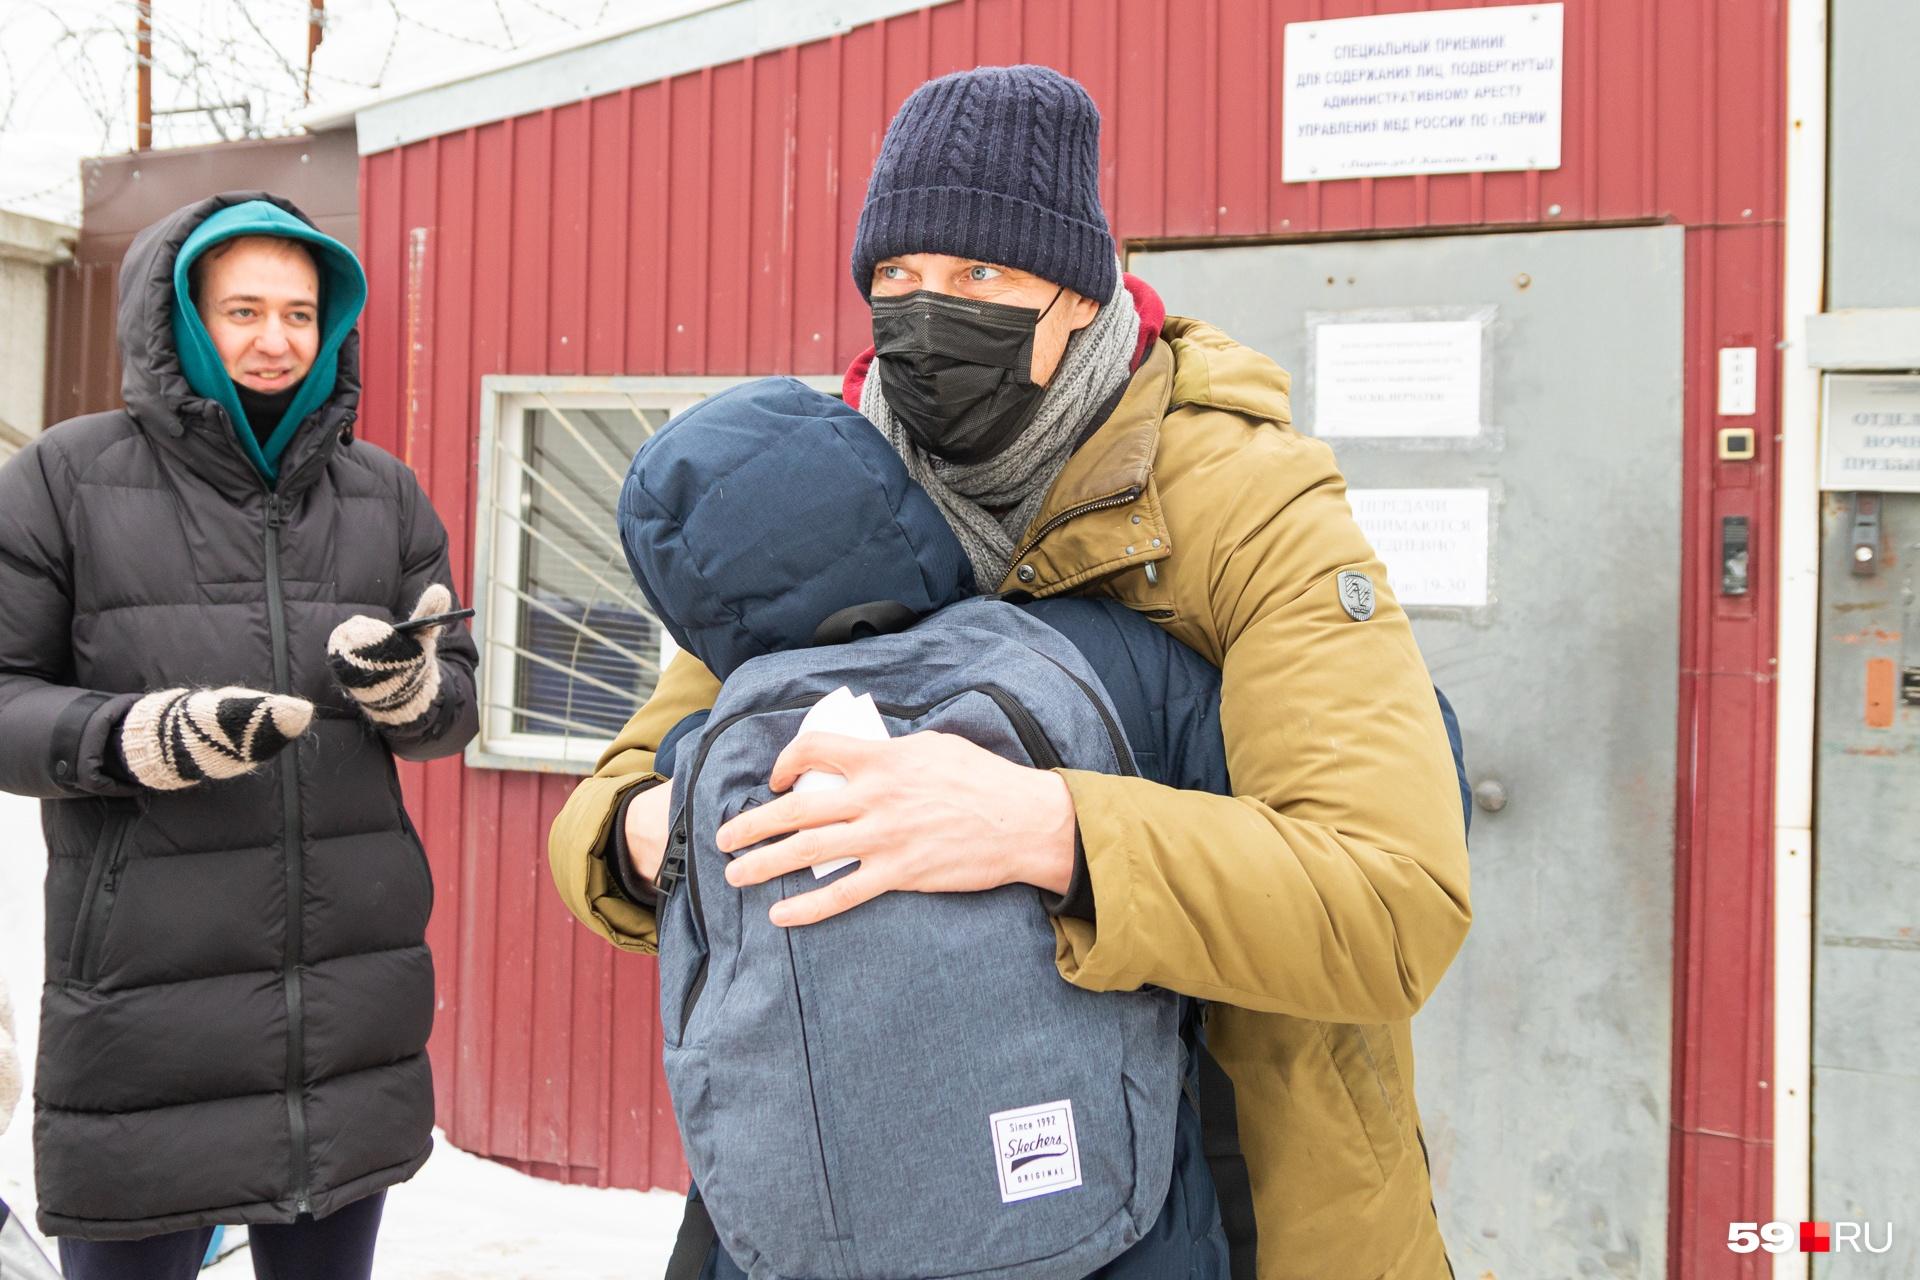 Активиста у ворот спецприемника встретила супруга